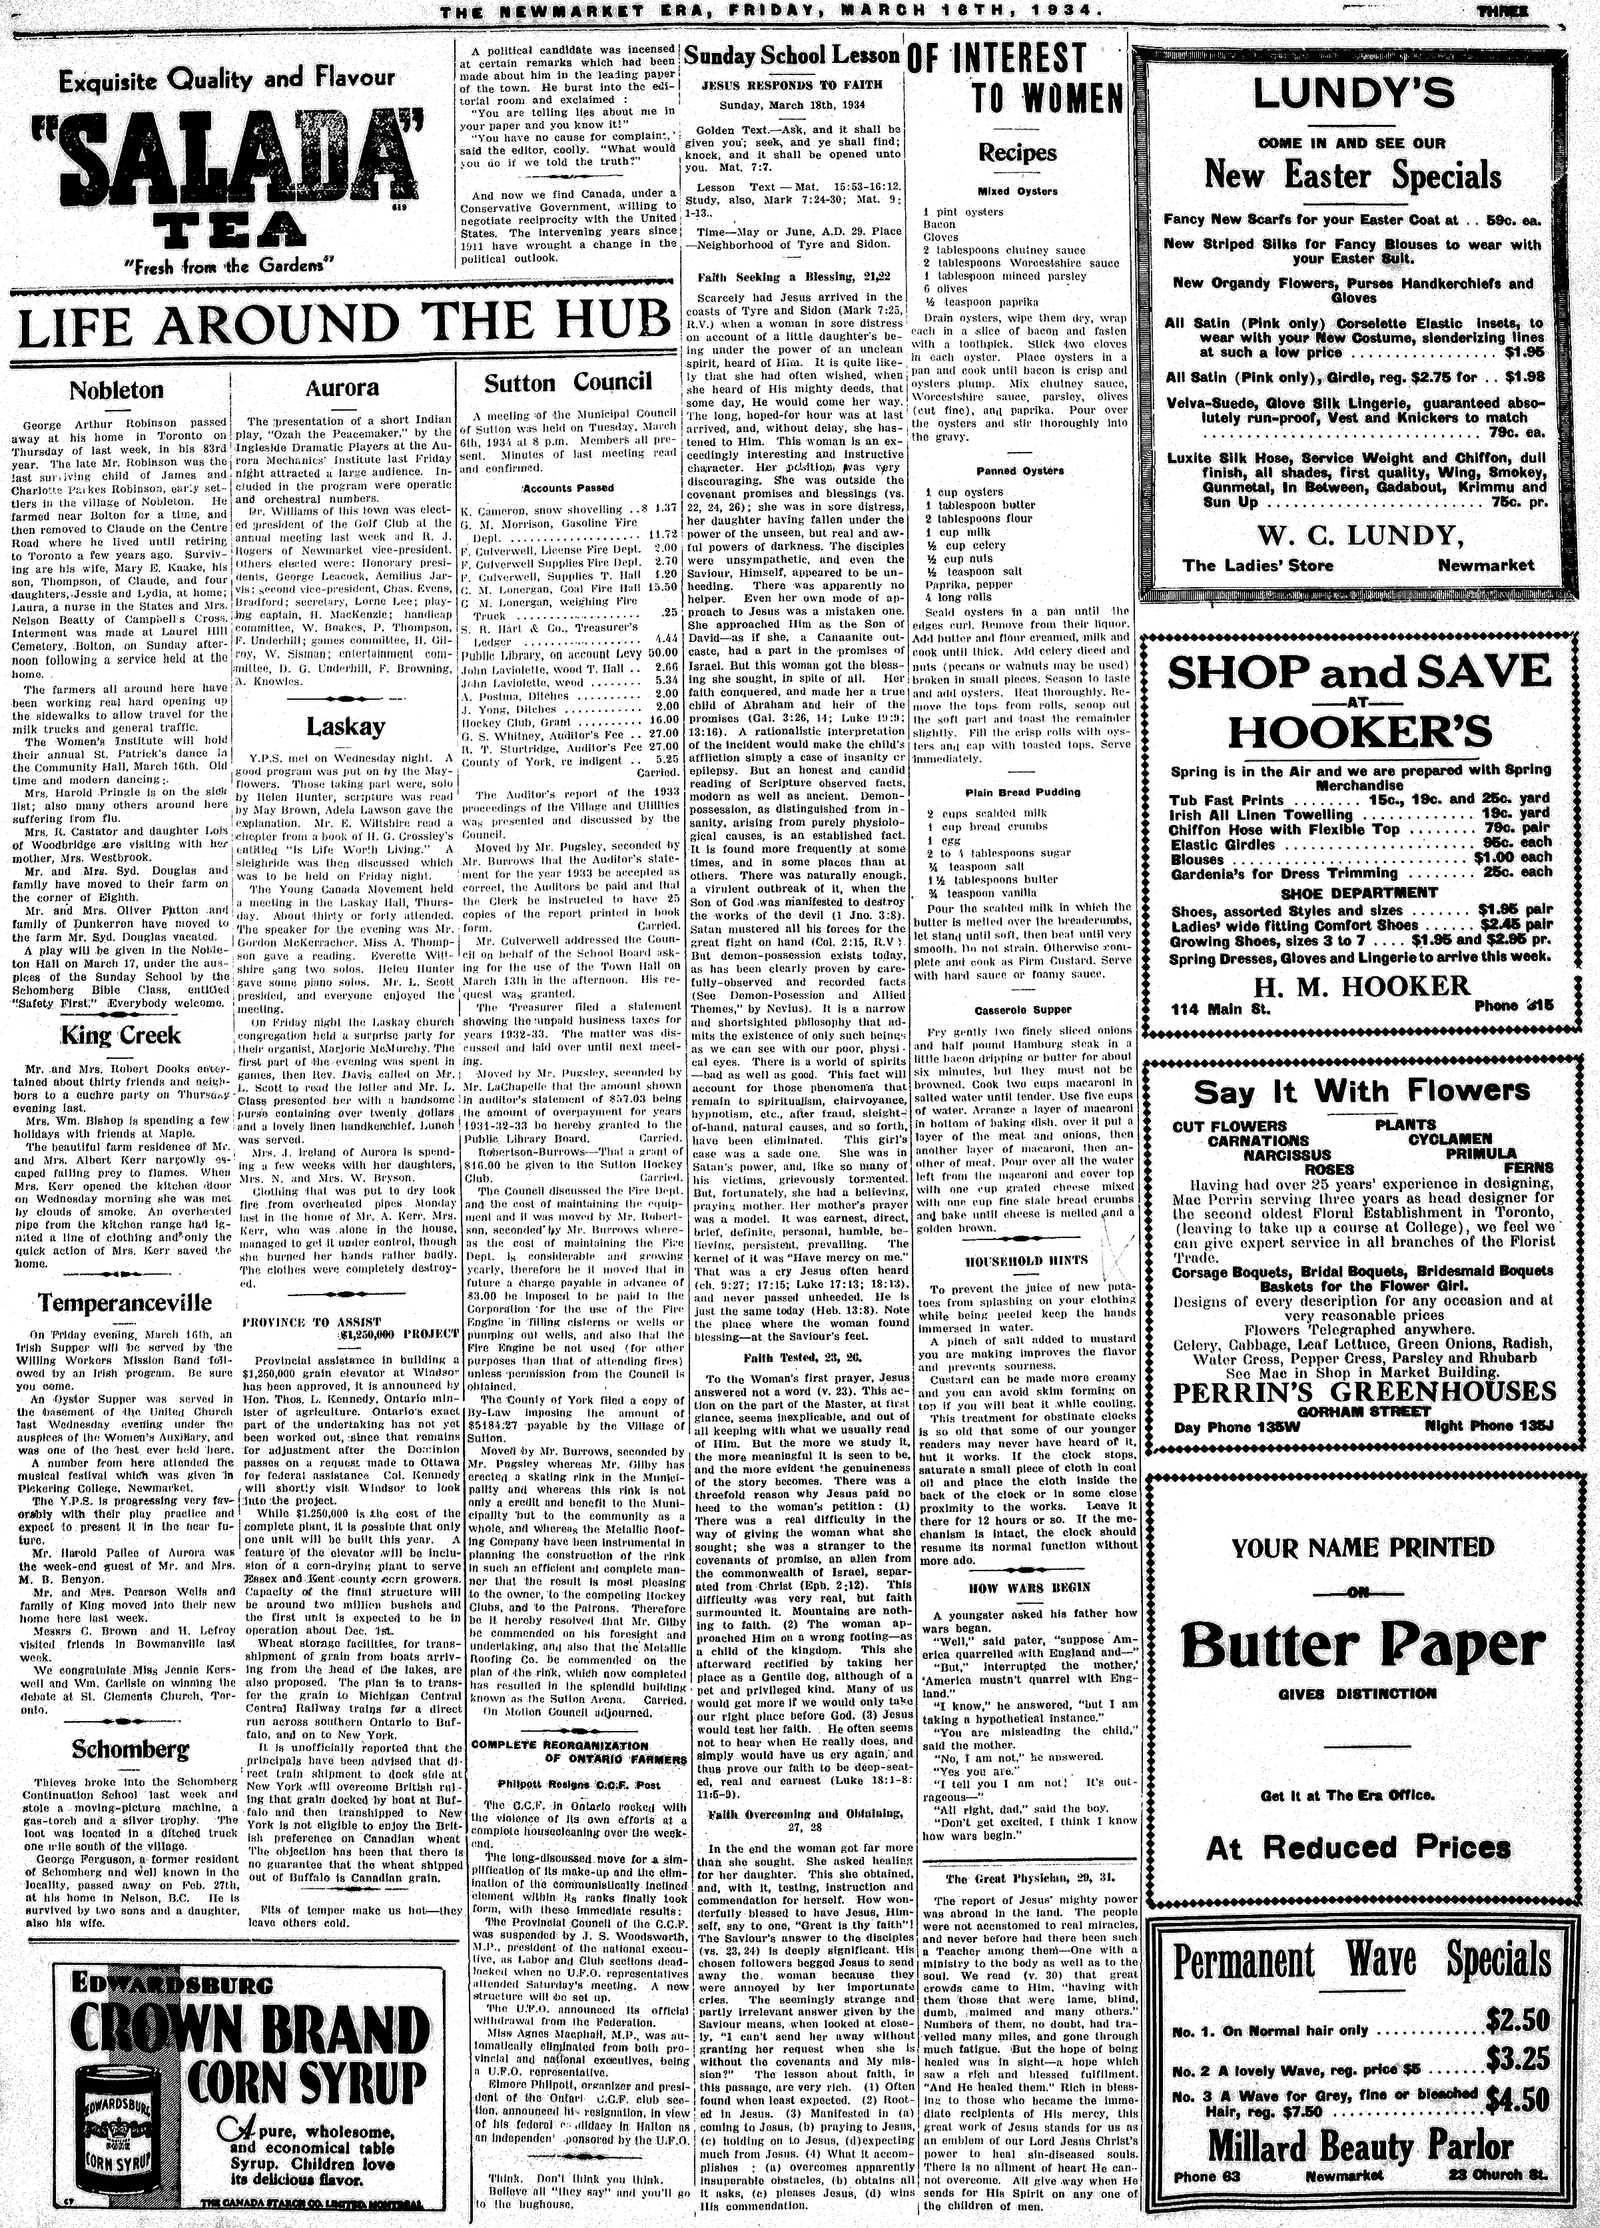 Newmarket Era (Newmarket, ON1861), March 16, 1934